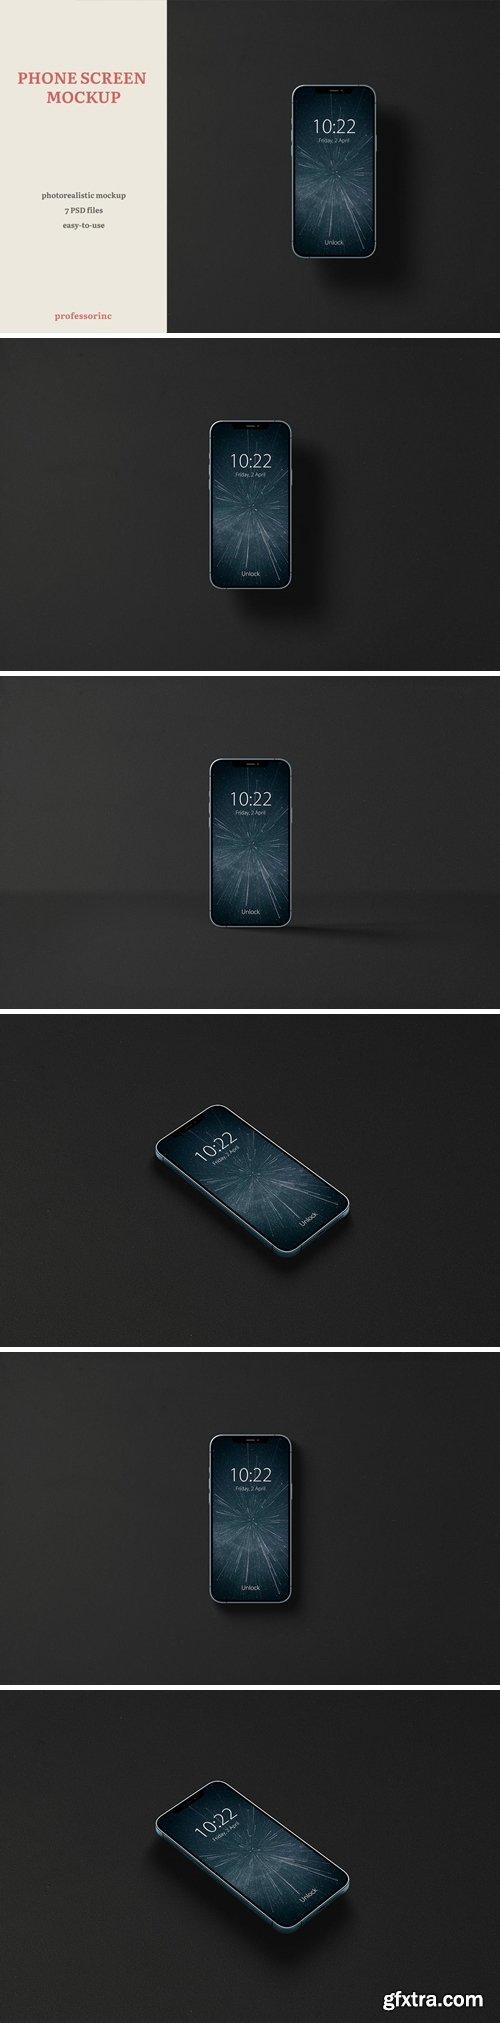 iPhone Screen Mockup